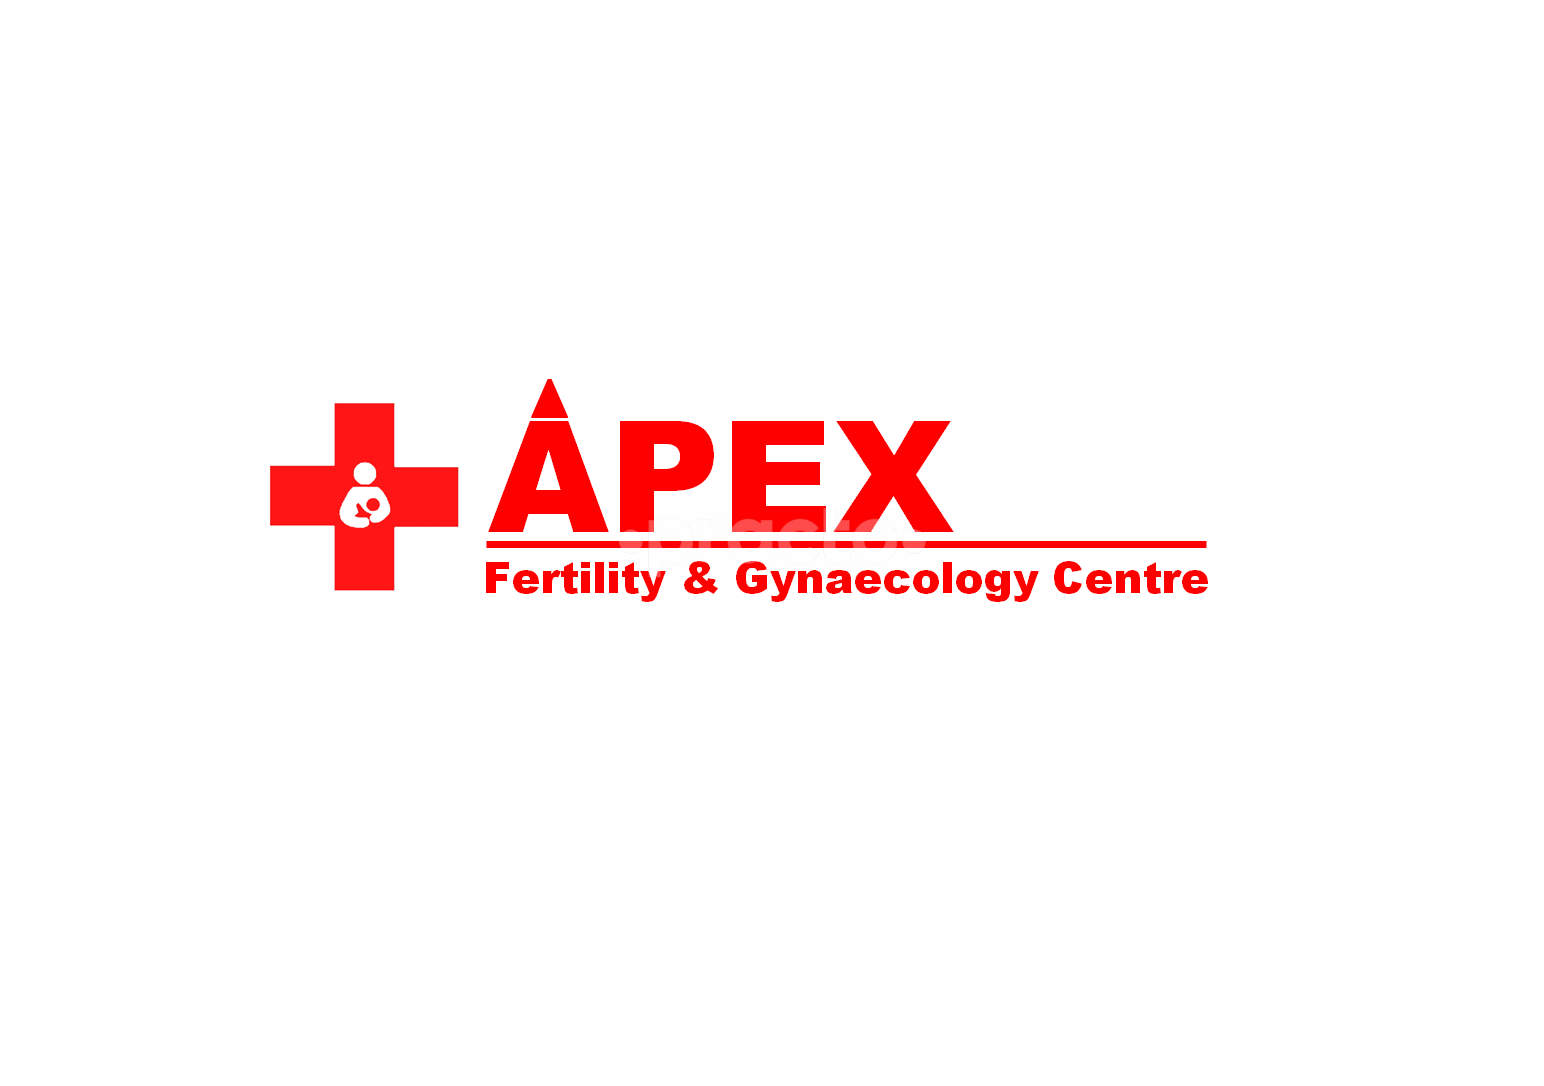 Apex Fertility & Gynaecology Centre